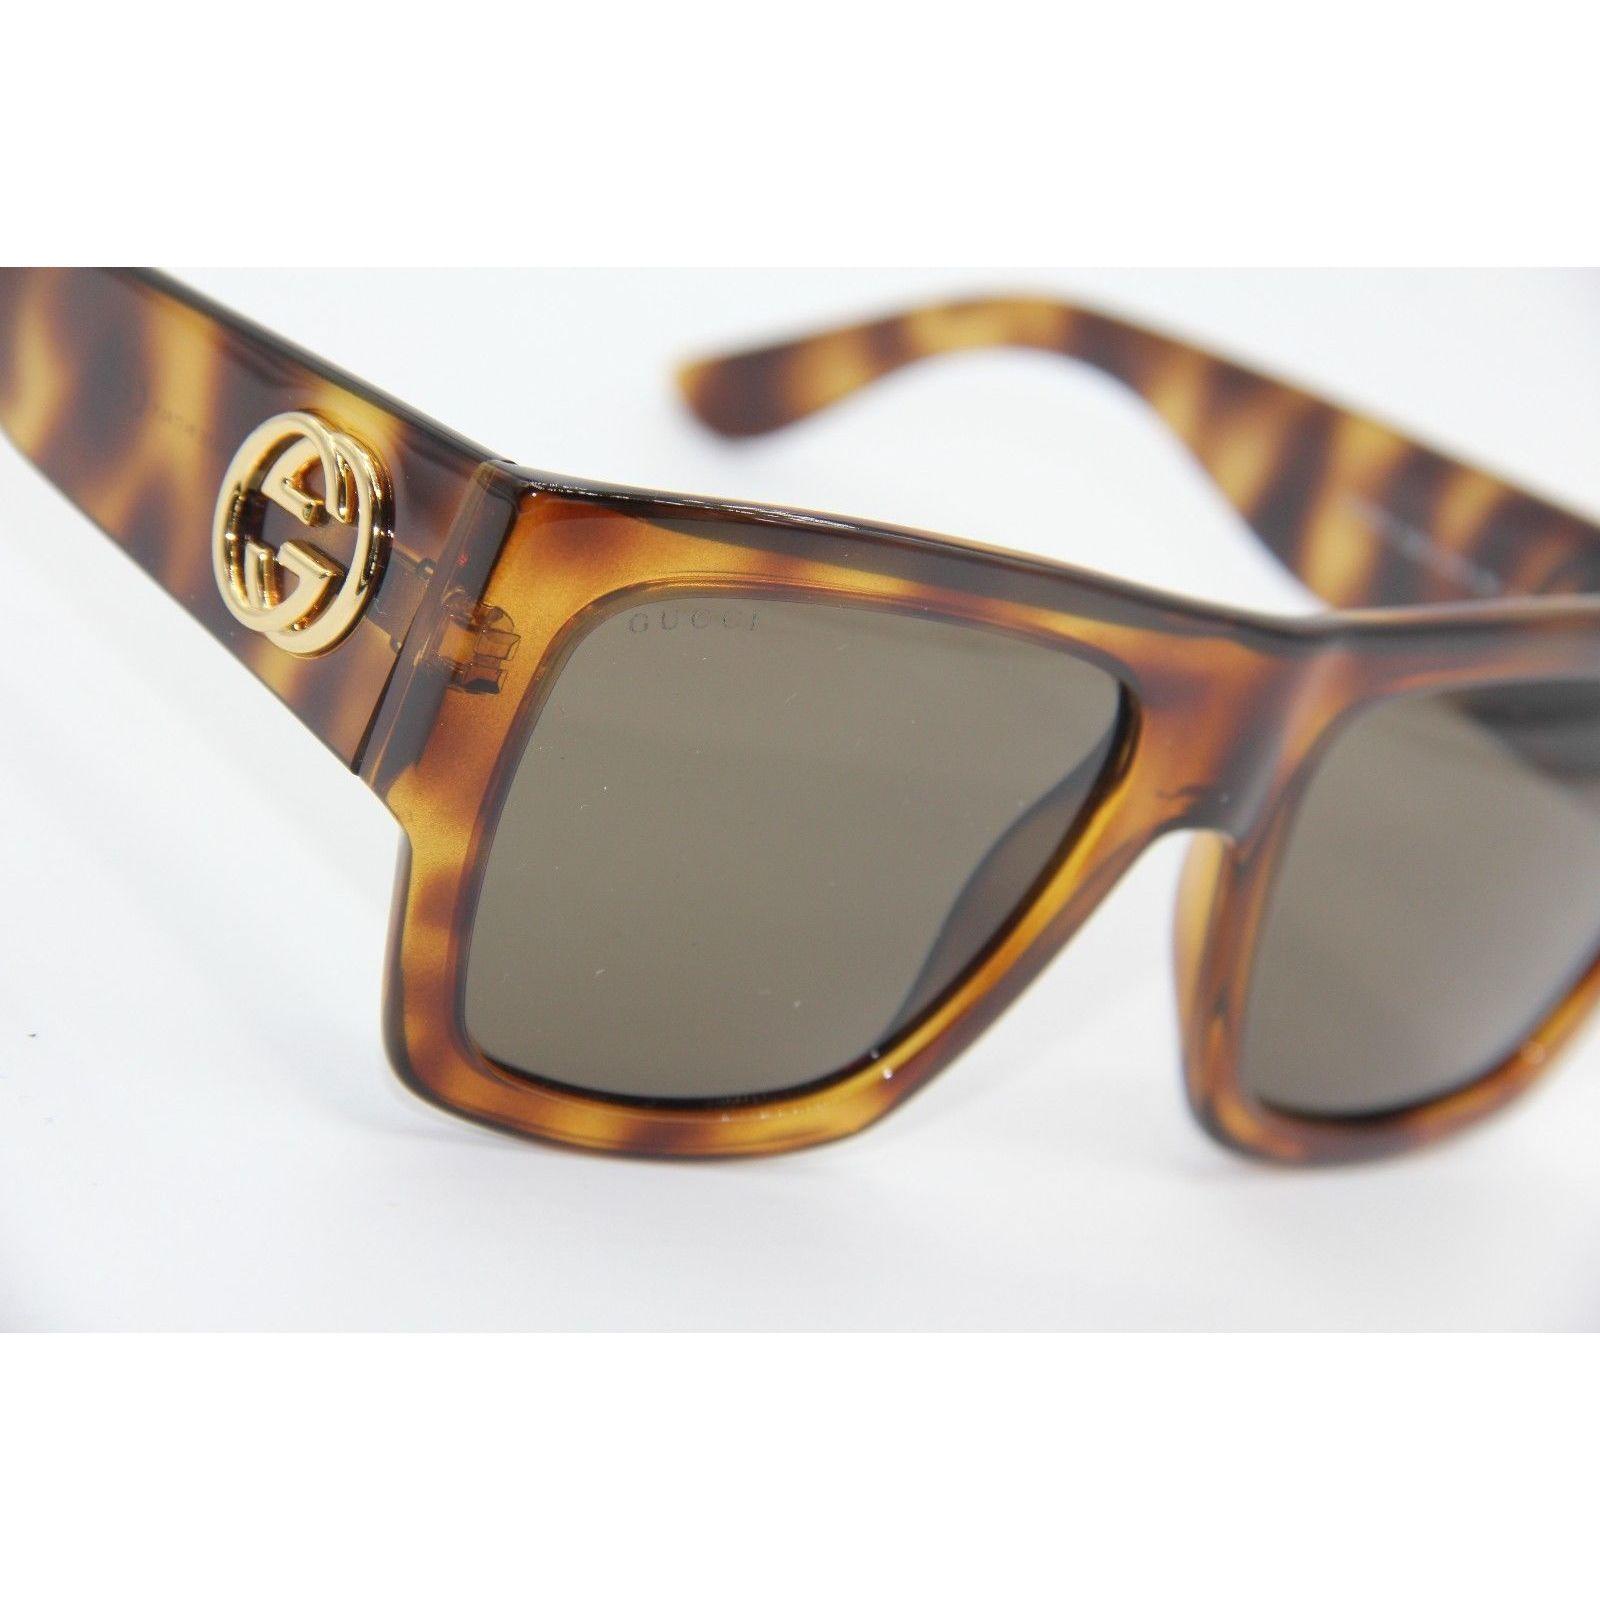 7b6287887f4 Shop Gucci GG 3817 S Light Havana Frame Black Lens Sunglasses - Free  Shipping Today - Overstock - 16803958